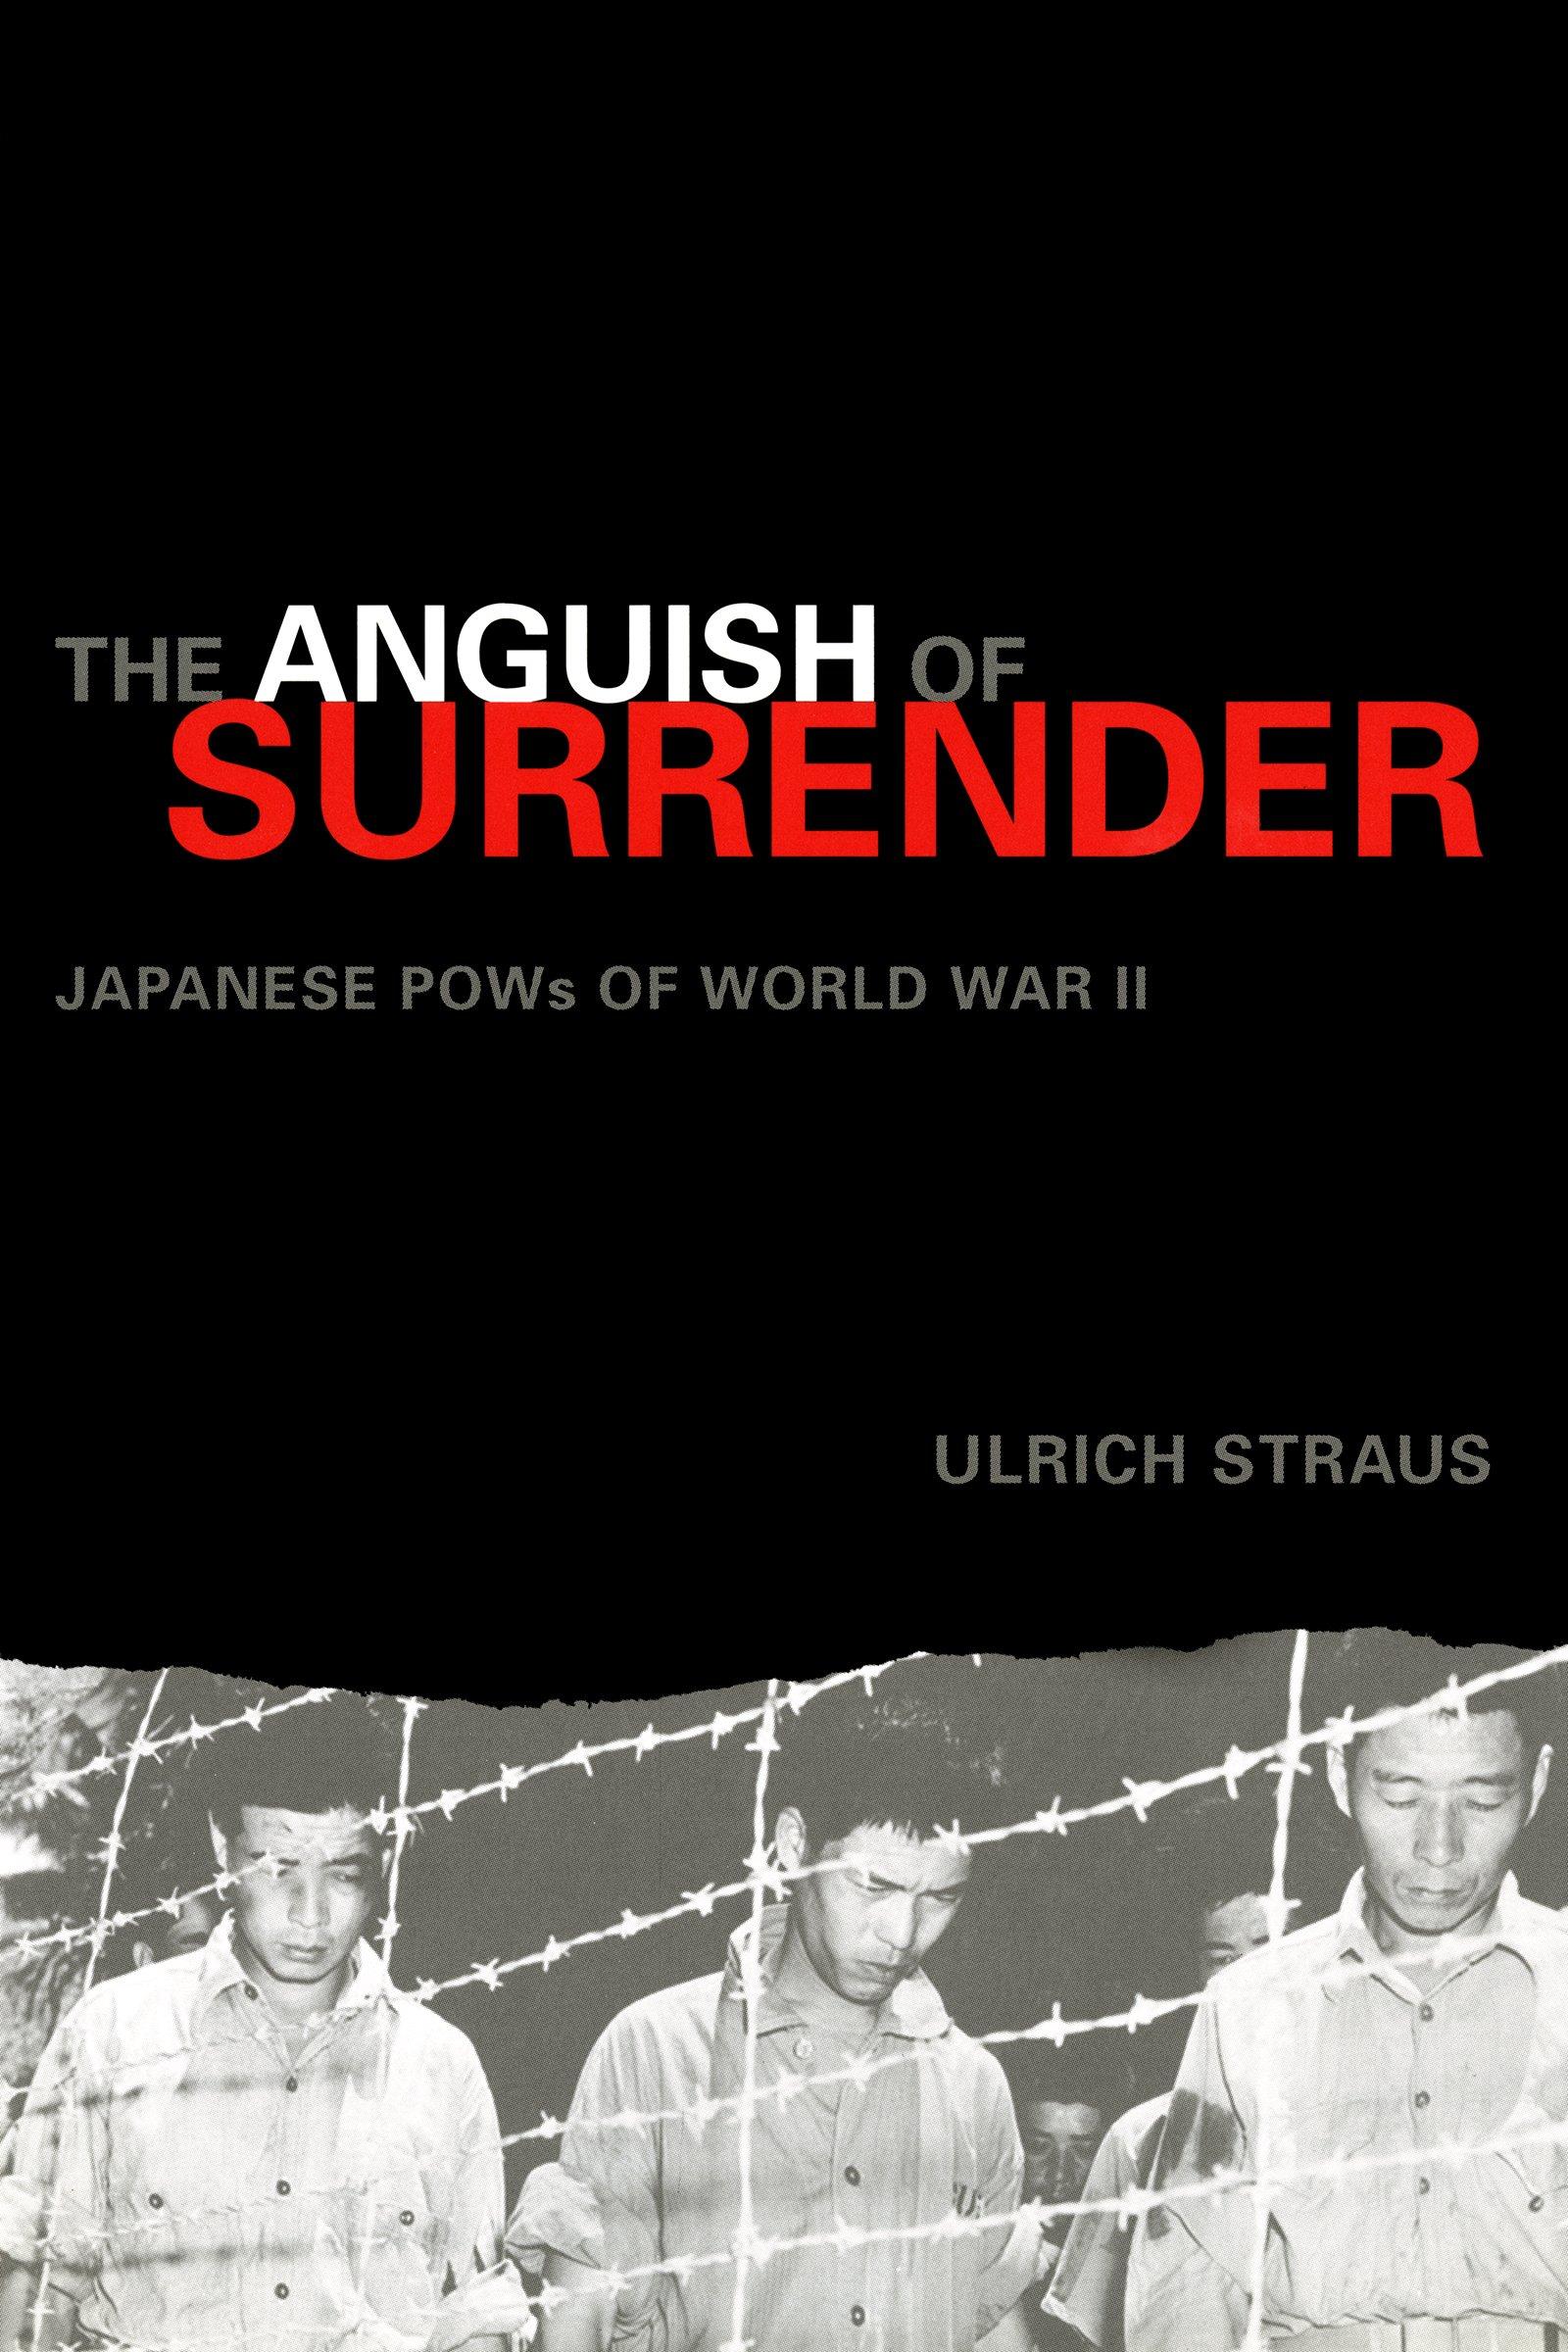 The Anguish of Surrender: Japanese POWs of World War II pdf epub